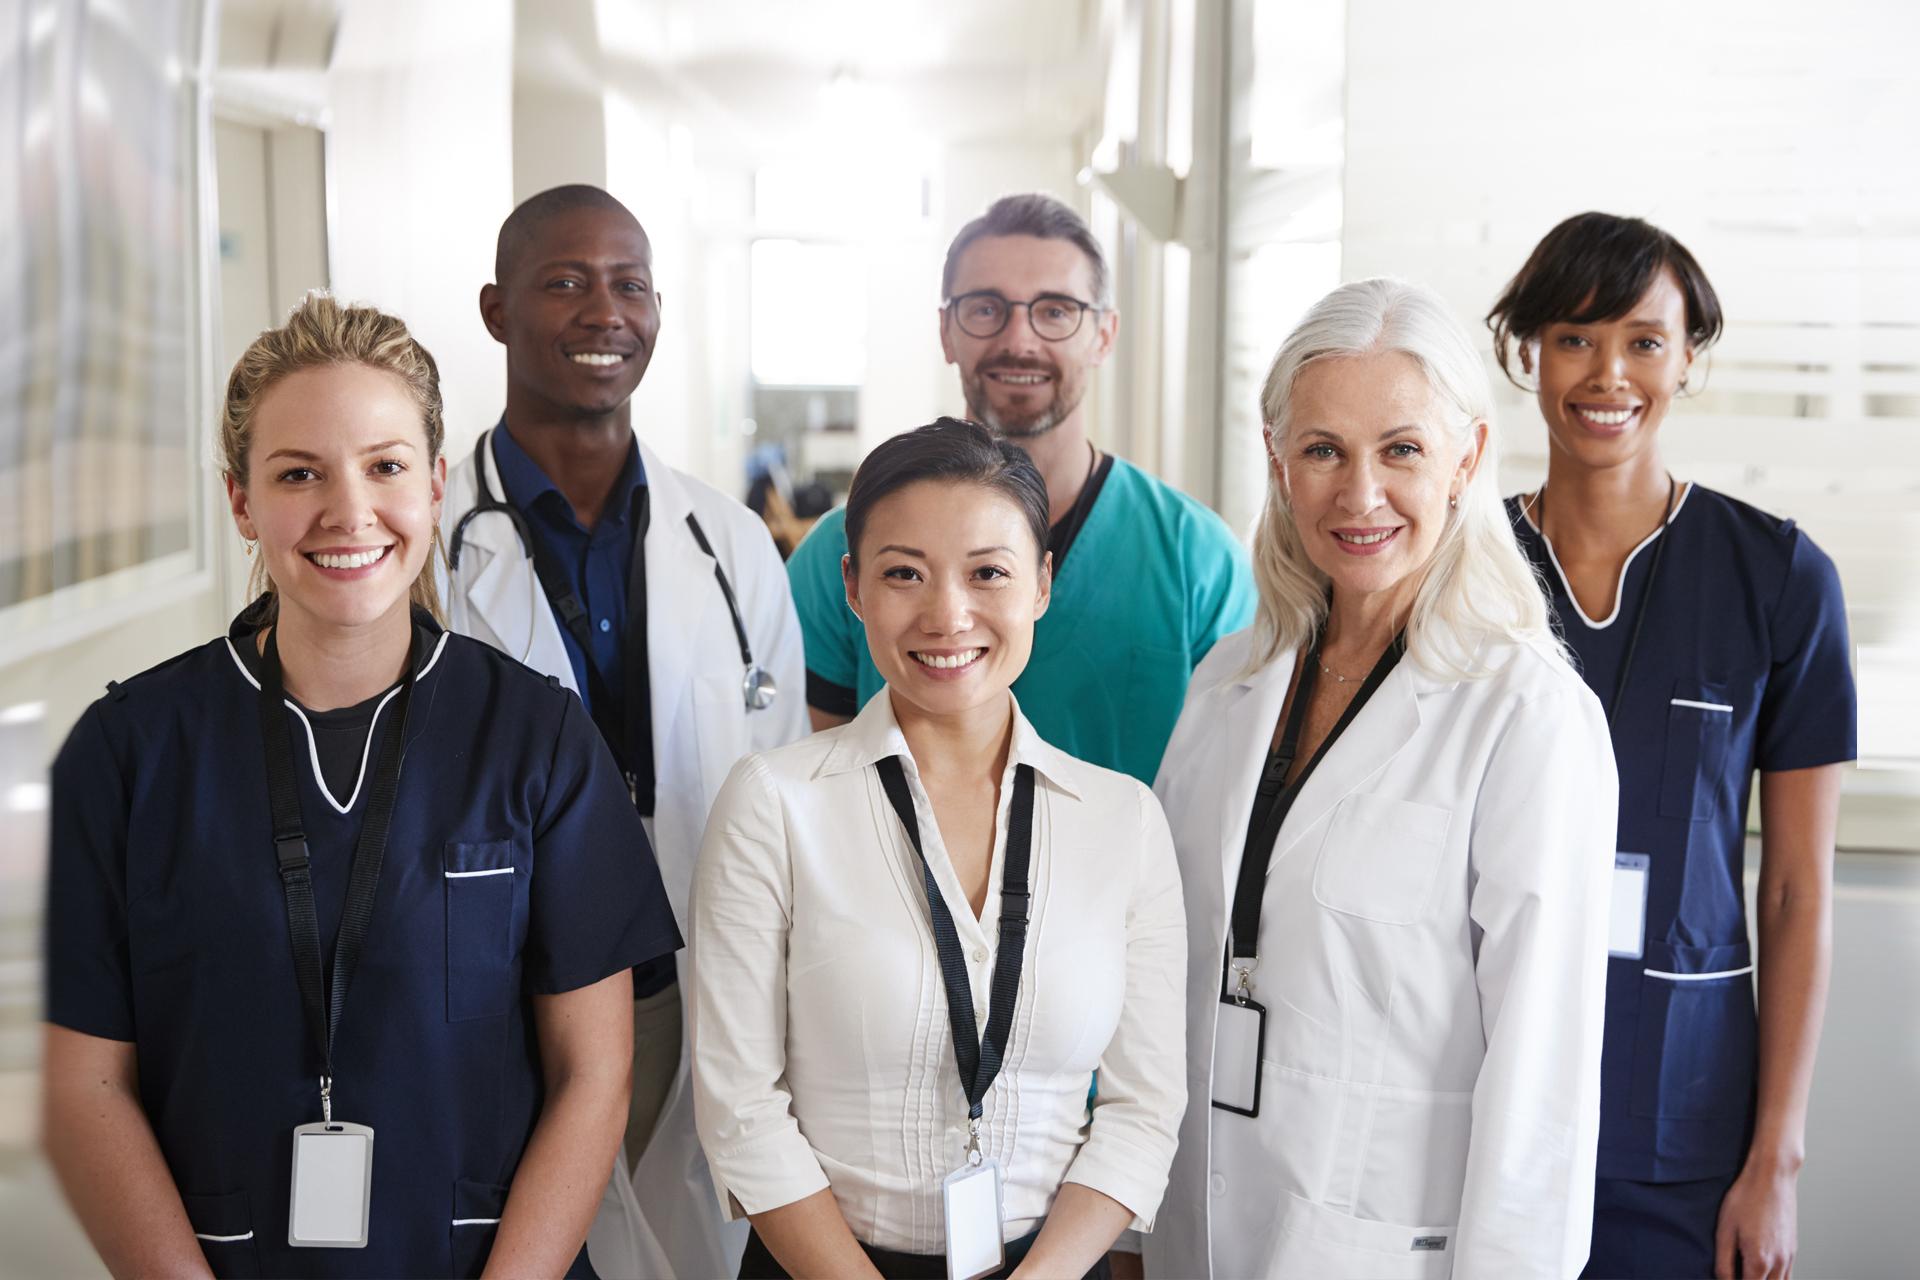 Medical team in hospital corridor